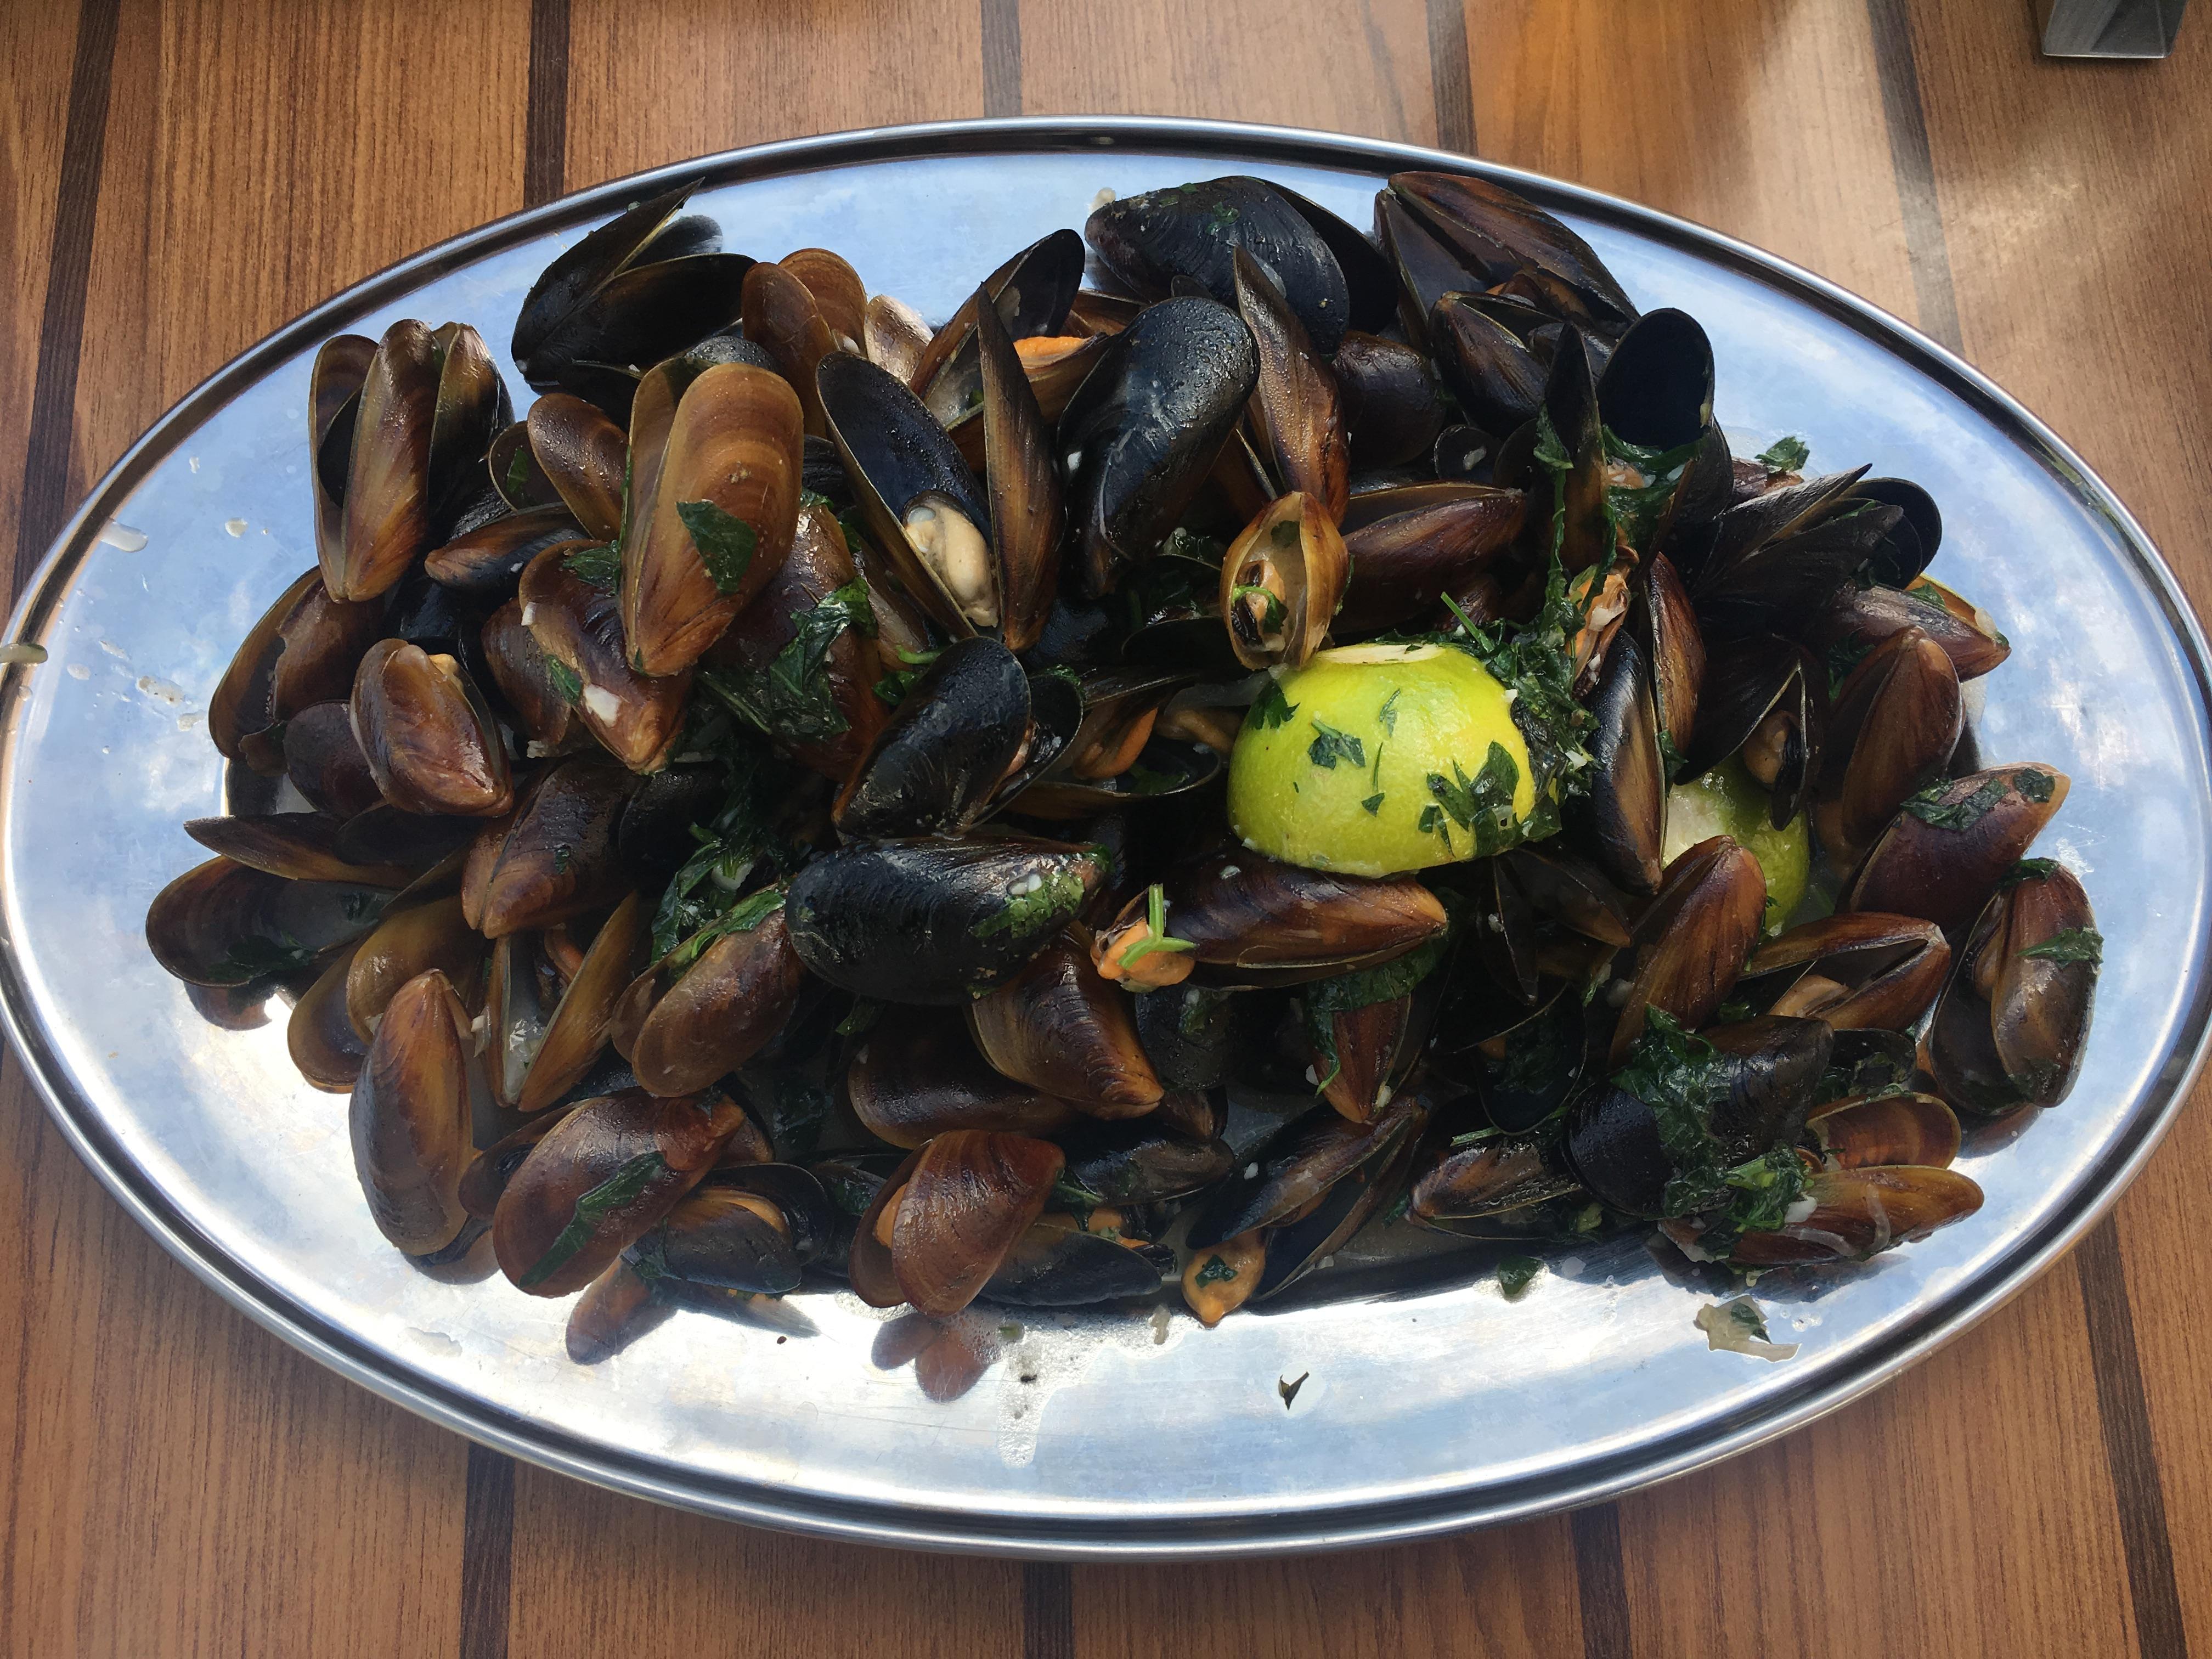 Black sea mussels at Djanny Restaurant in Sunny Beach, Bulgaria